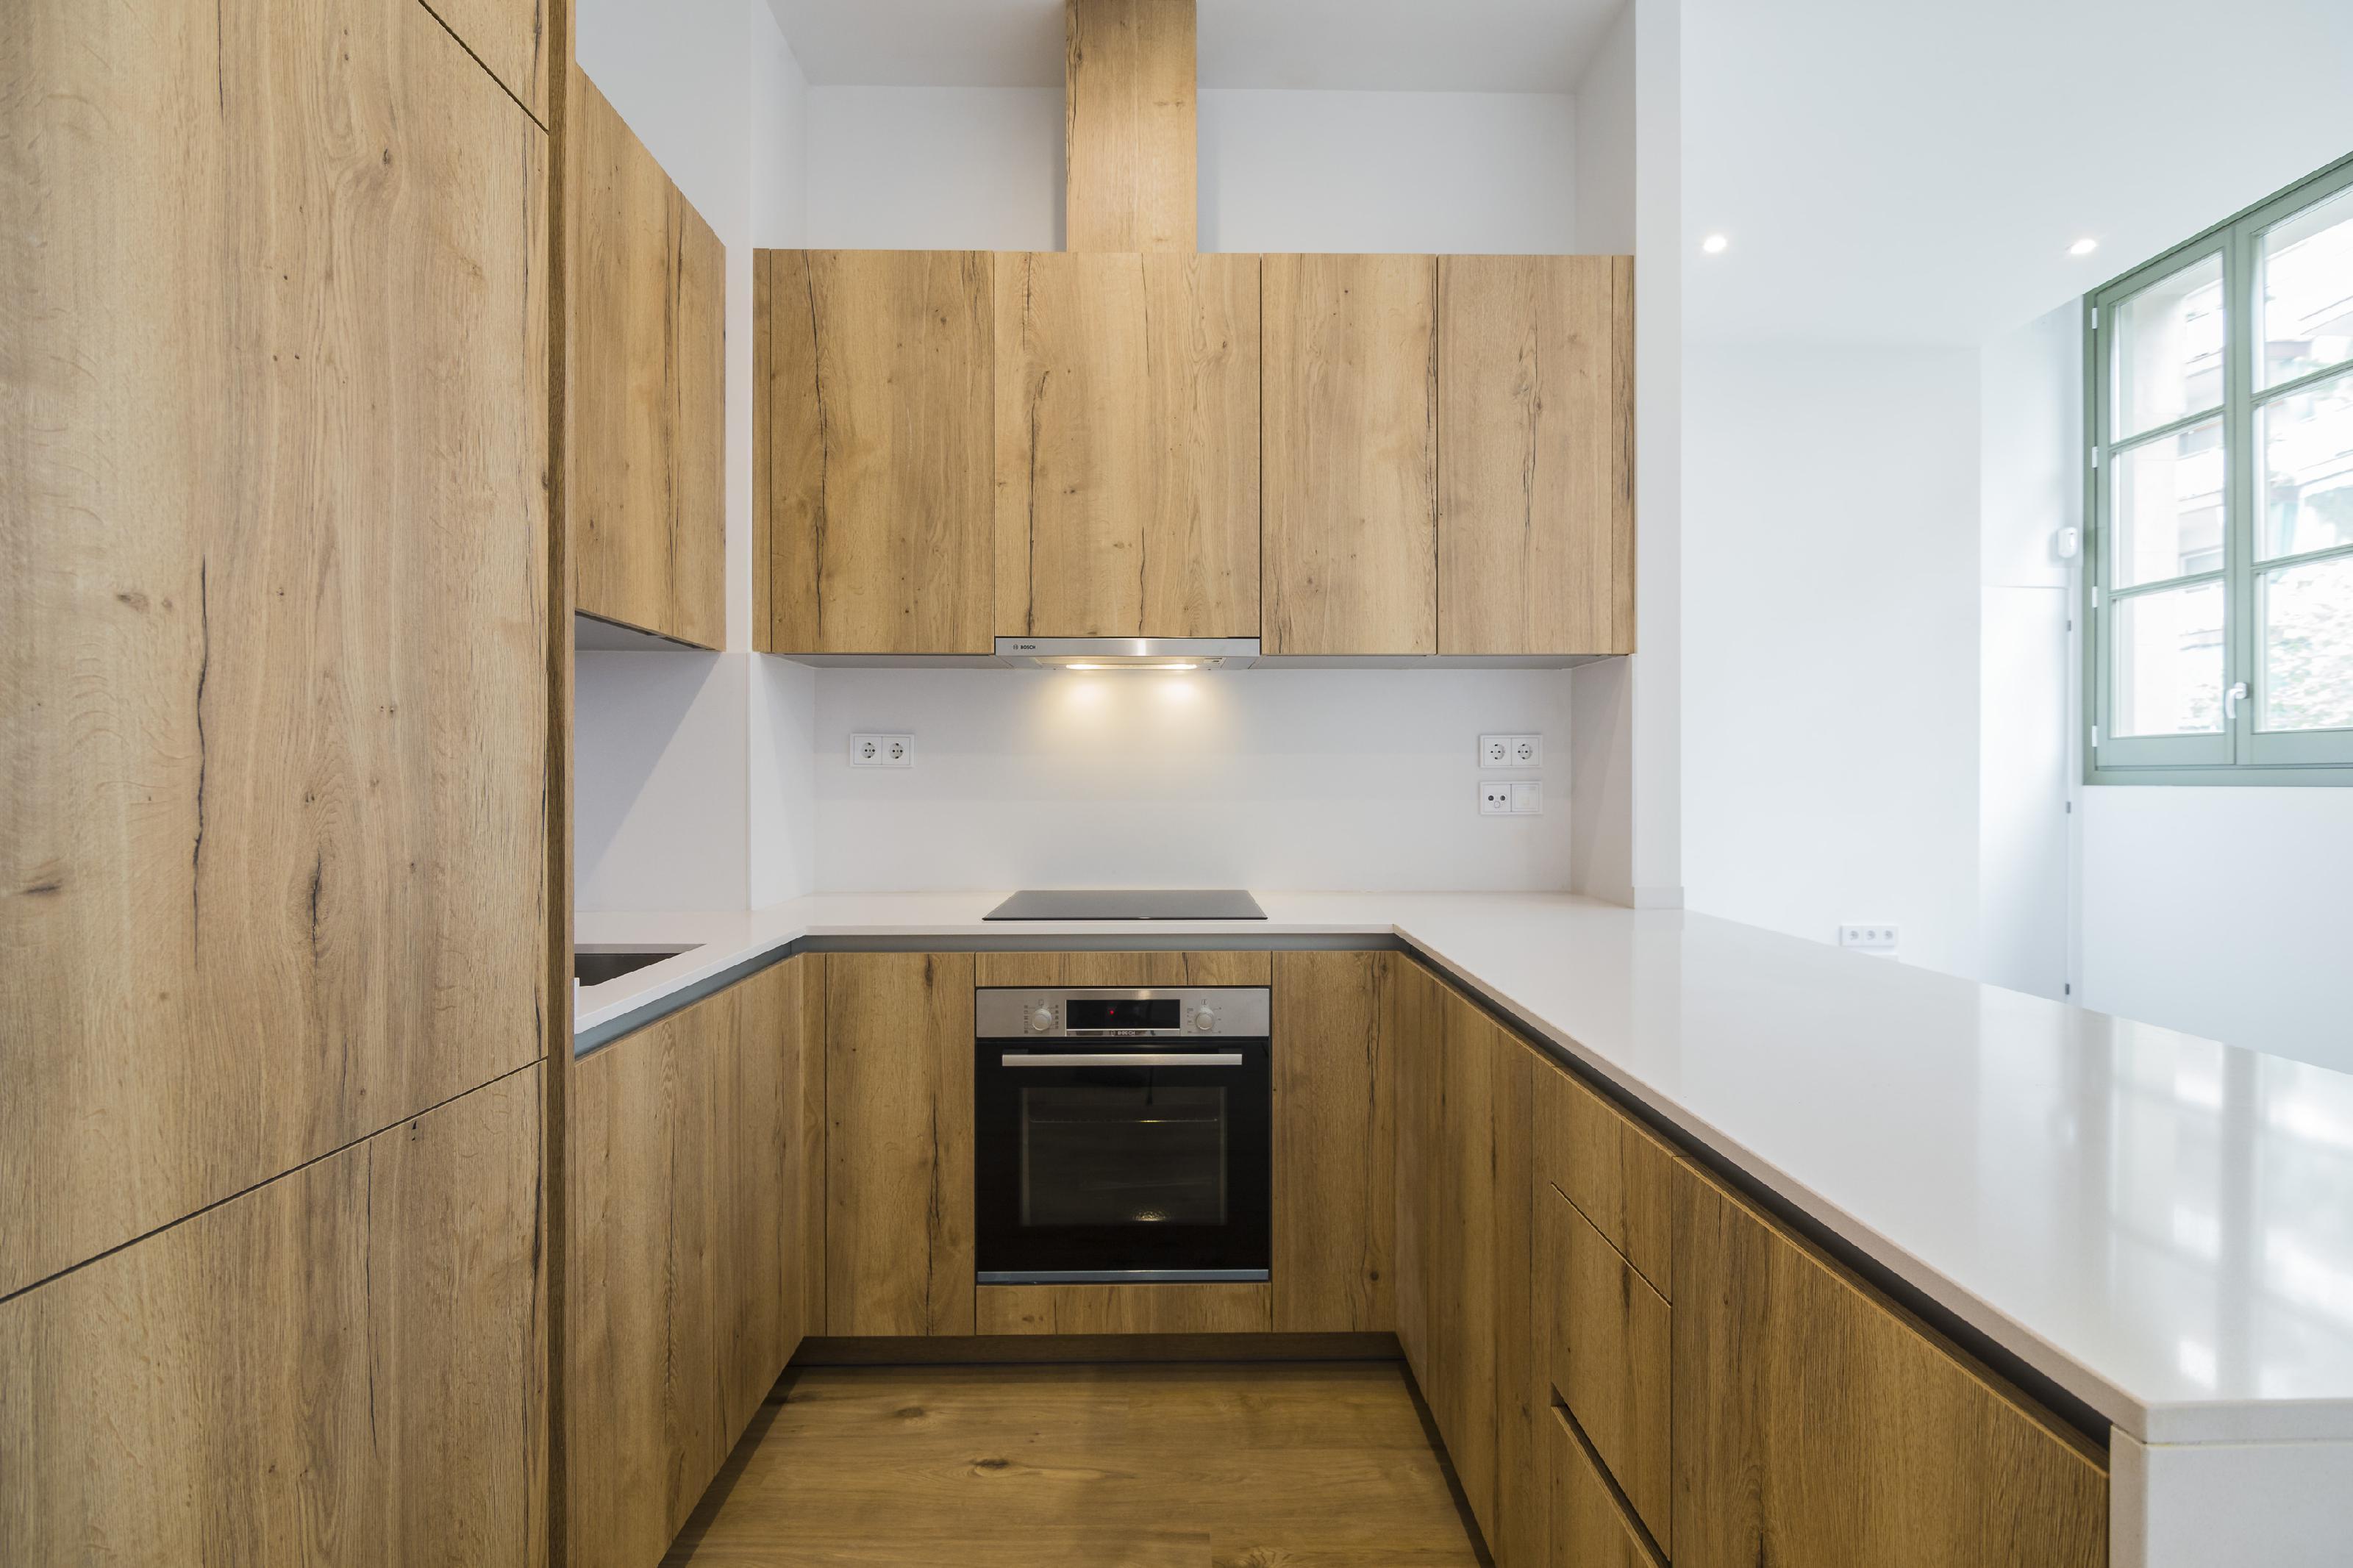 249267 Flat for sale in Eixample, Nova Esquerra Eixample 7